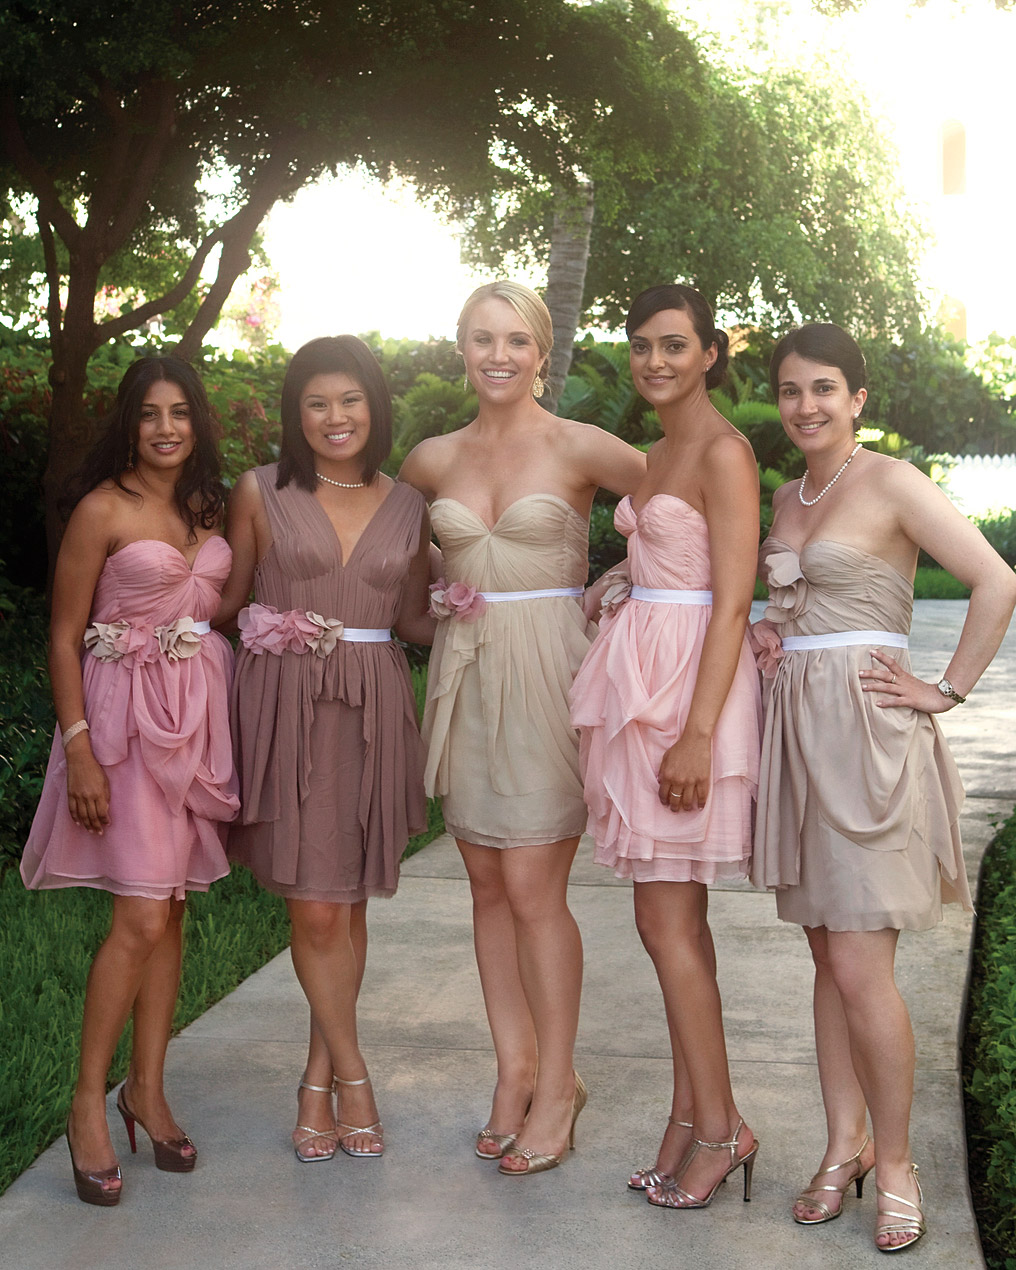 rw-anne-josh-bridesmaids-mwd106057.jpg